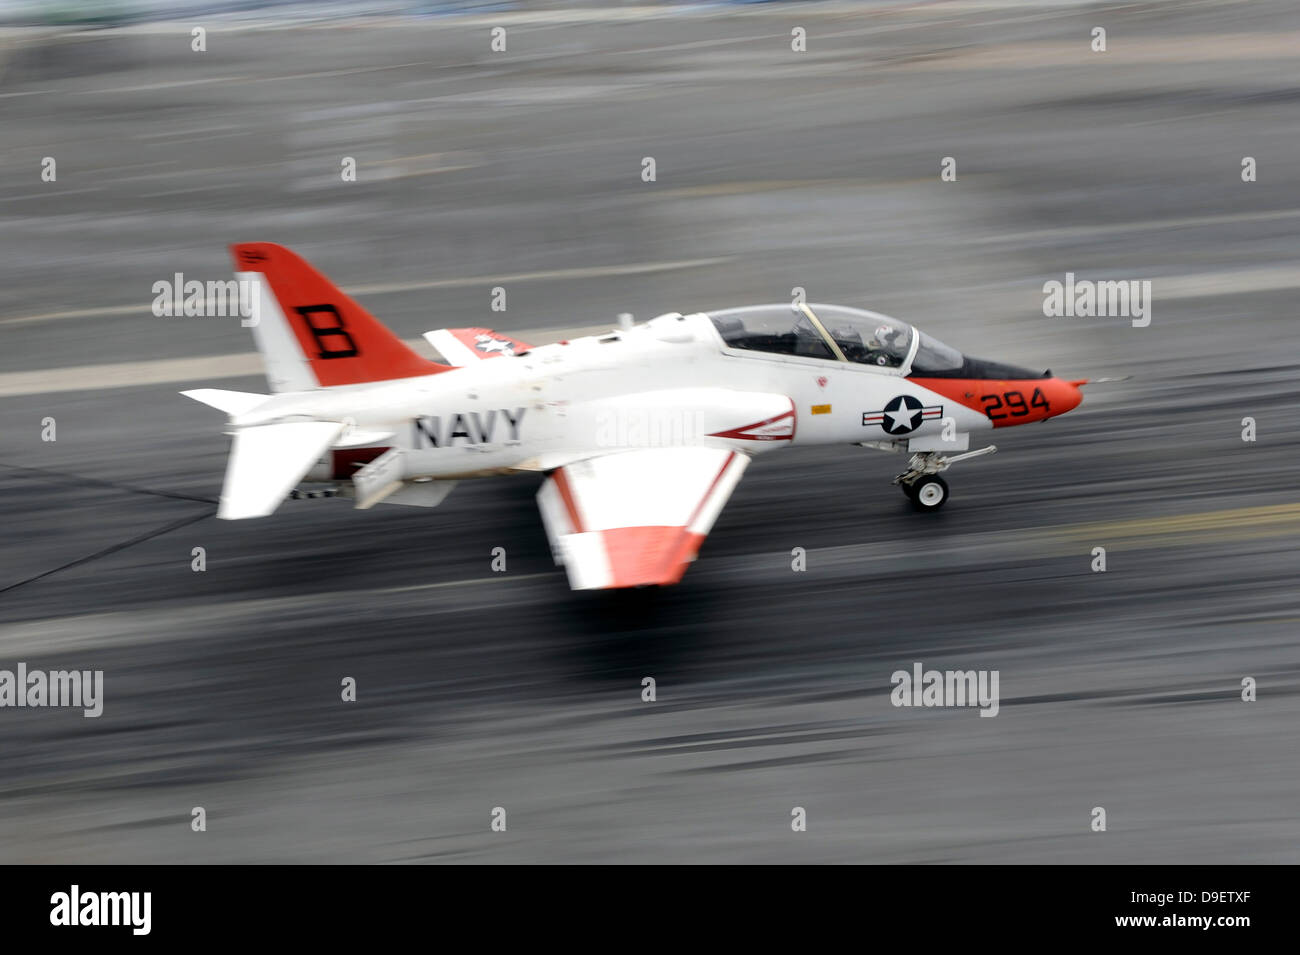 A T-45C Goshawk training aircraft makes an arrested landing. - Stock Image